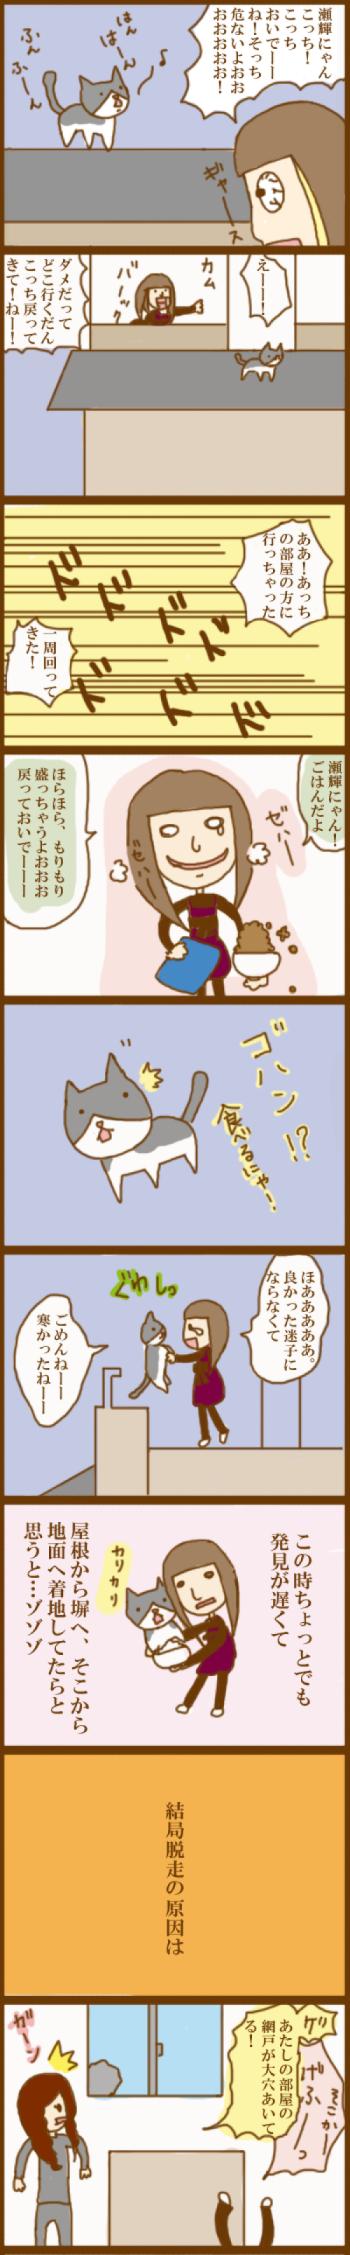 f:id:suzuokayu:20201012010809j:plain